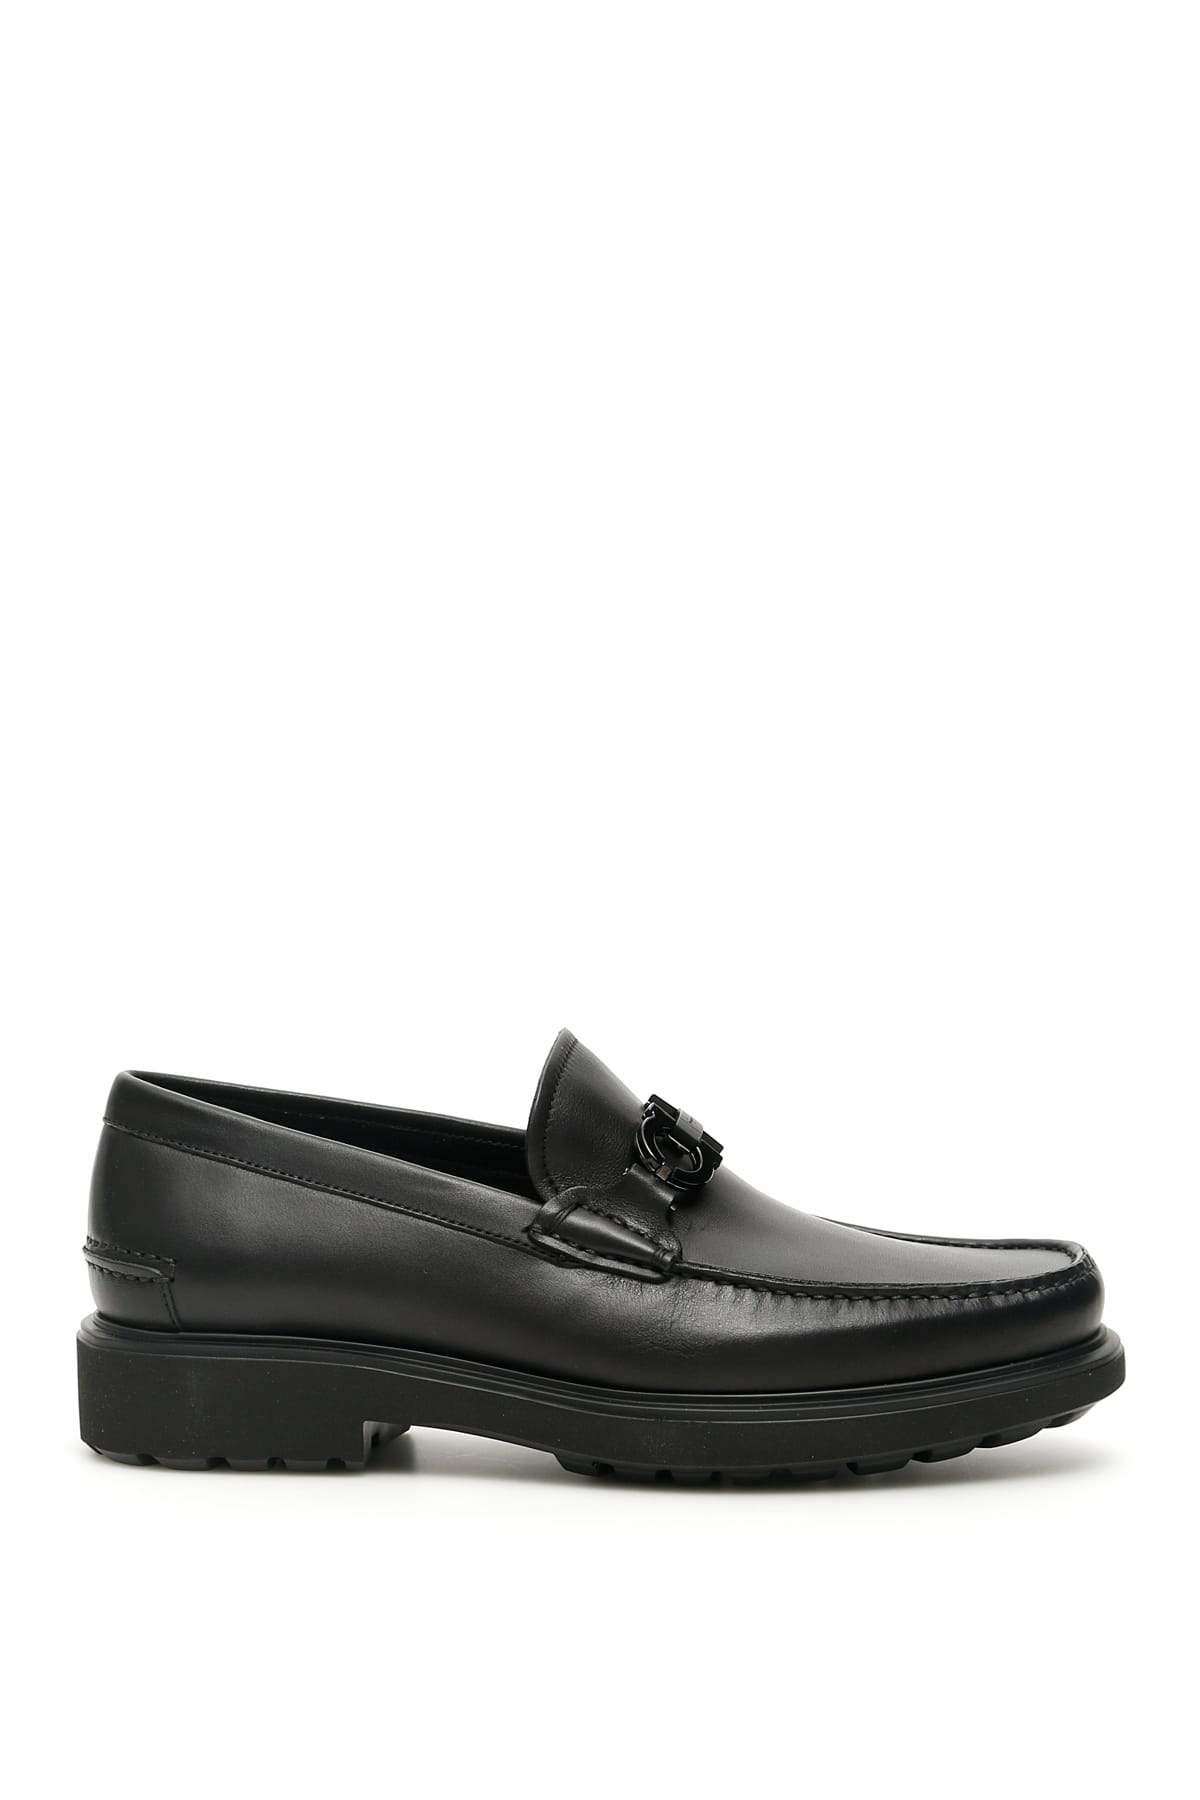 Salvatore Ferragamo Gotham Loafers